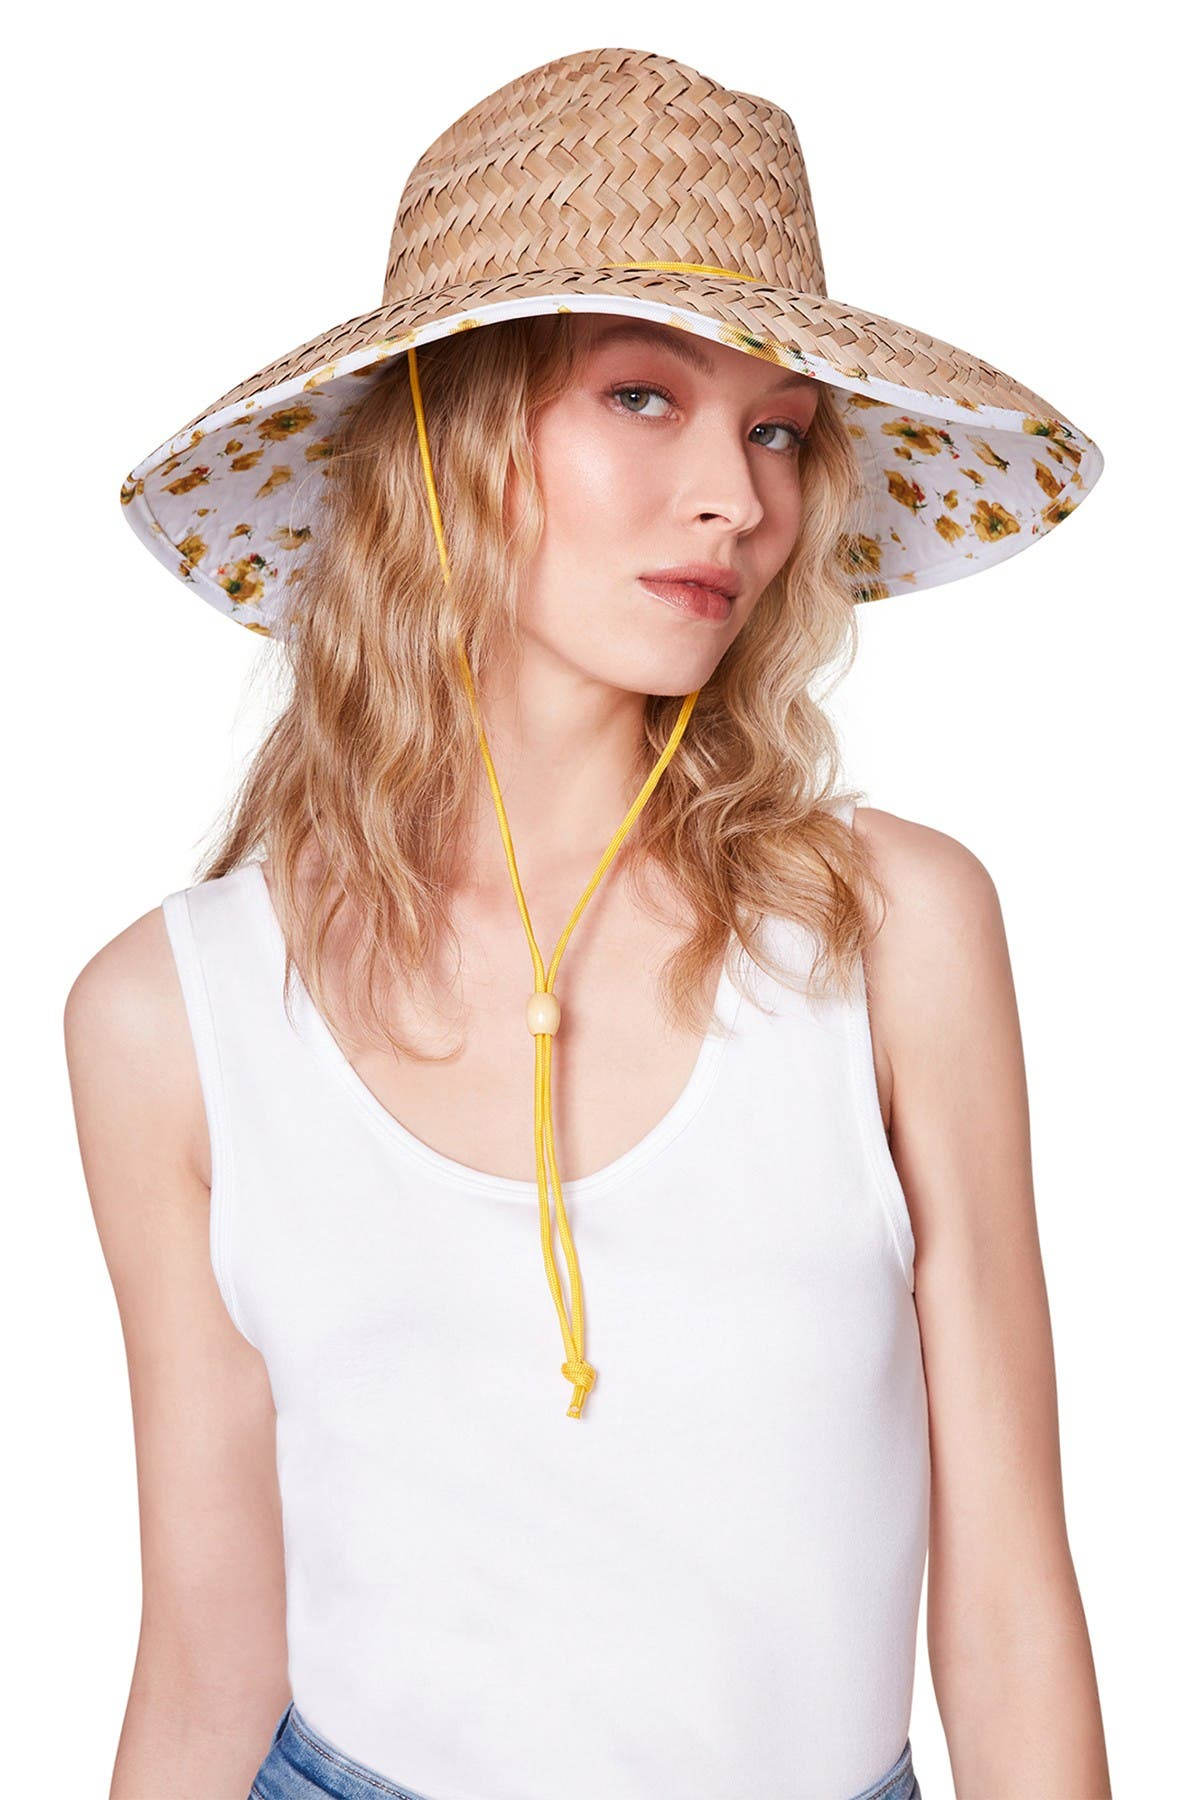 Image of Steve Madden Woven Paper Straw Sun Hat